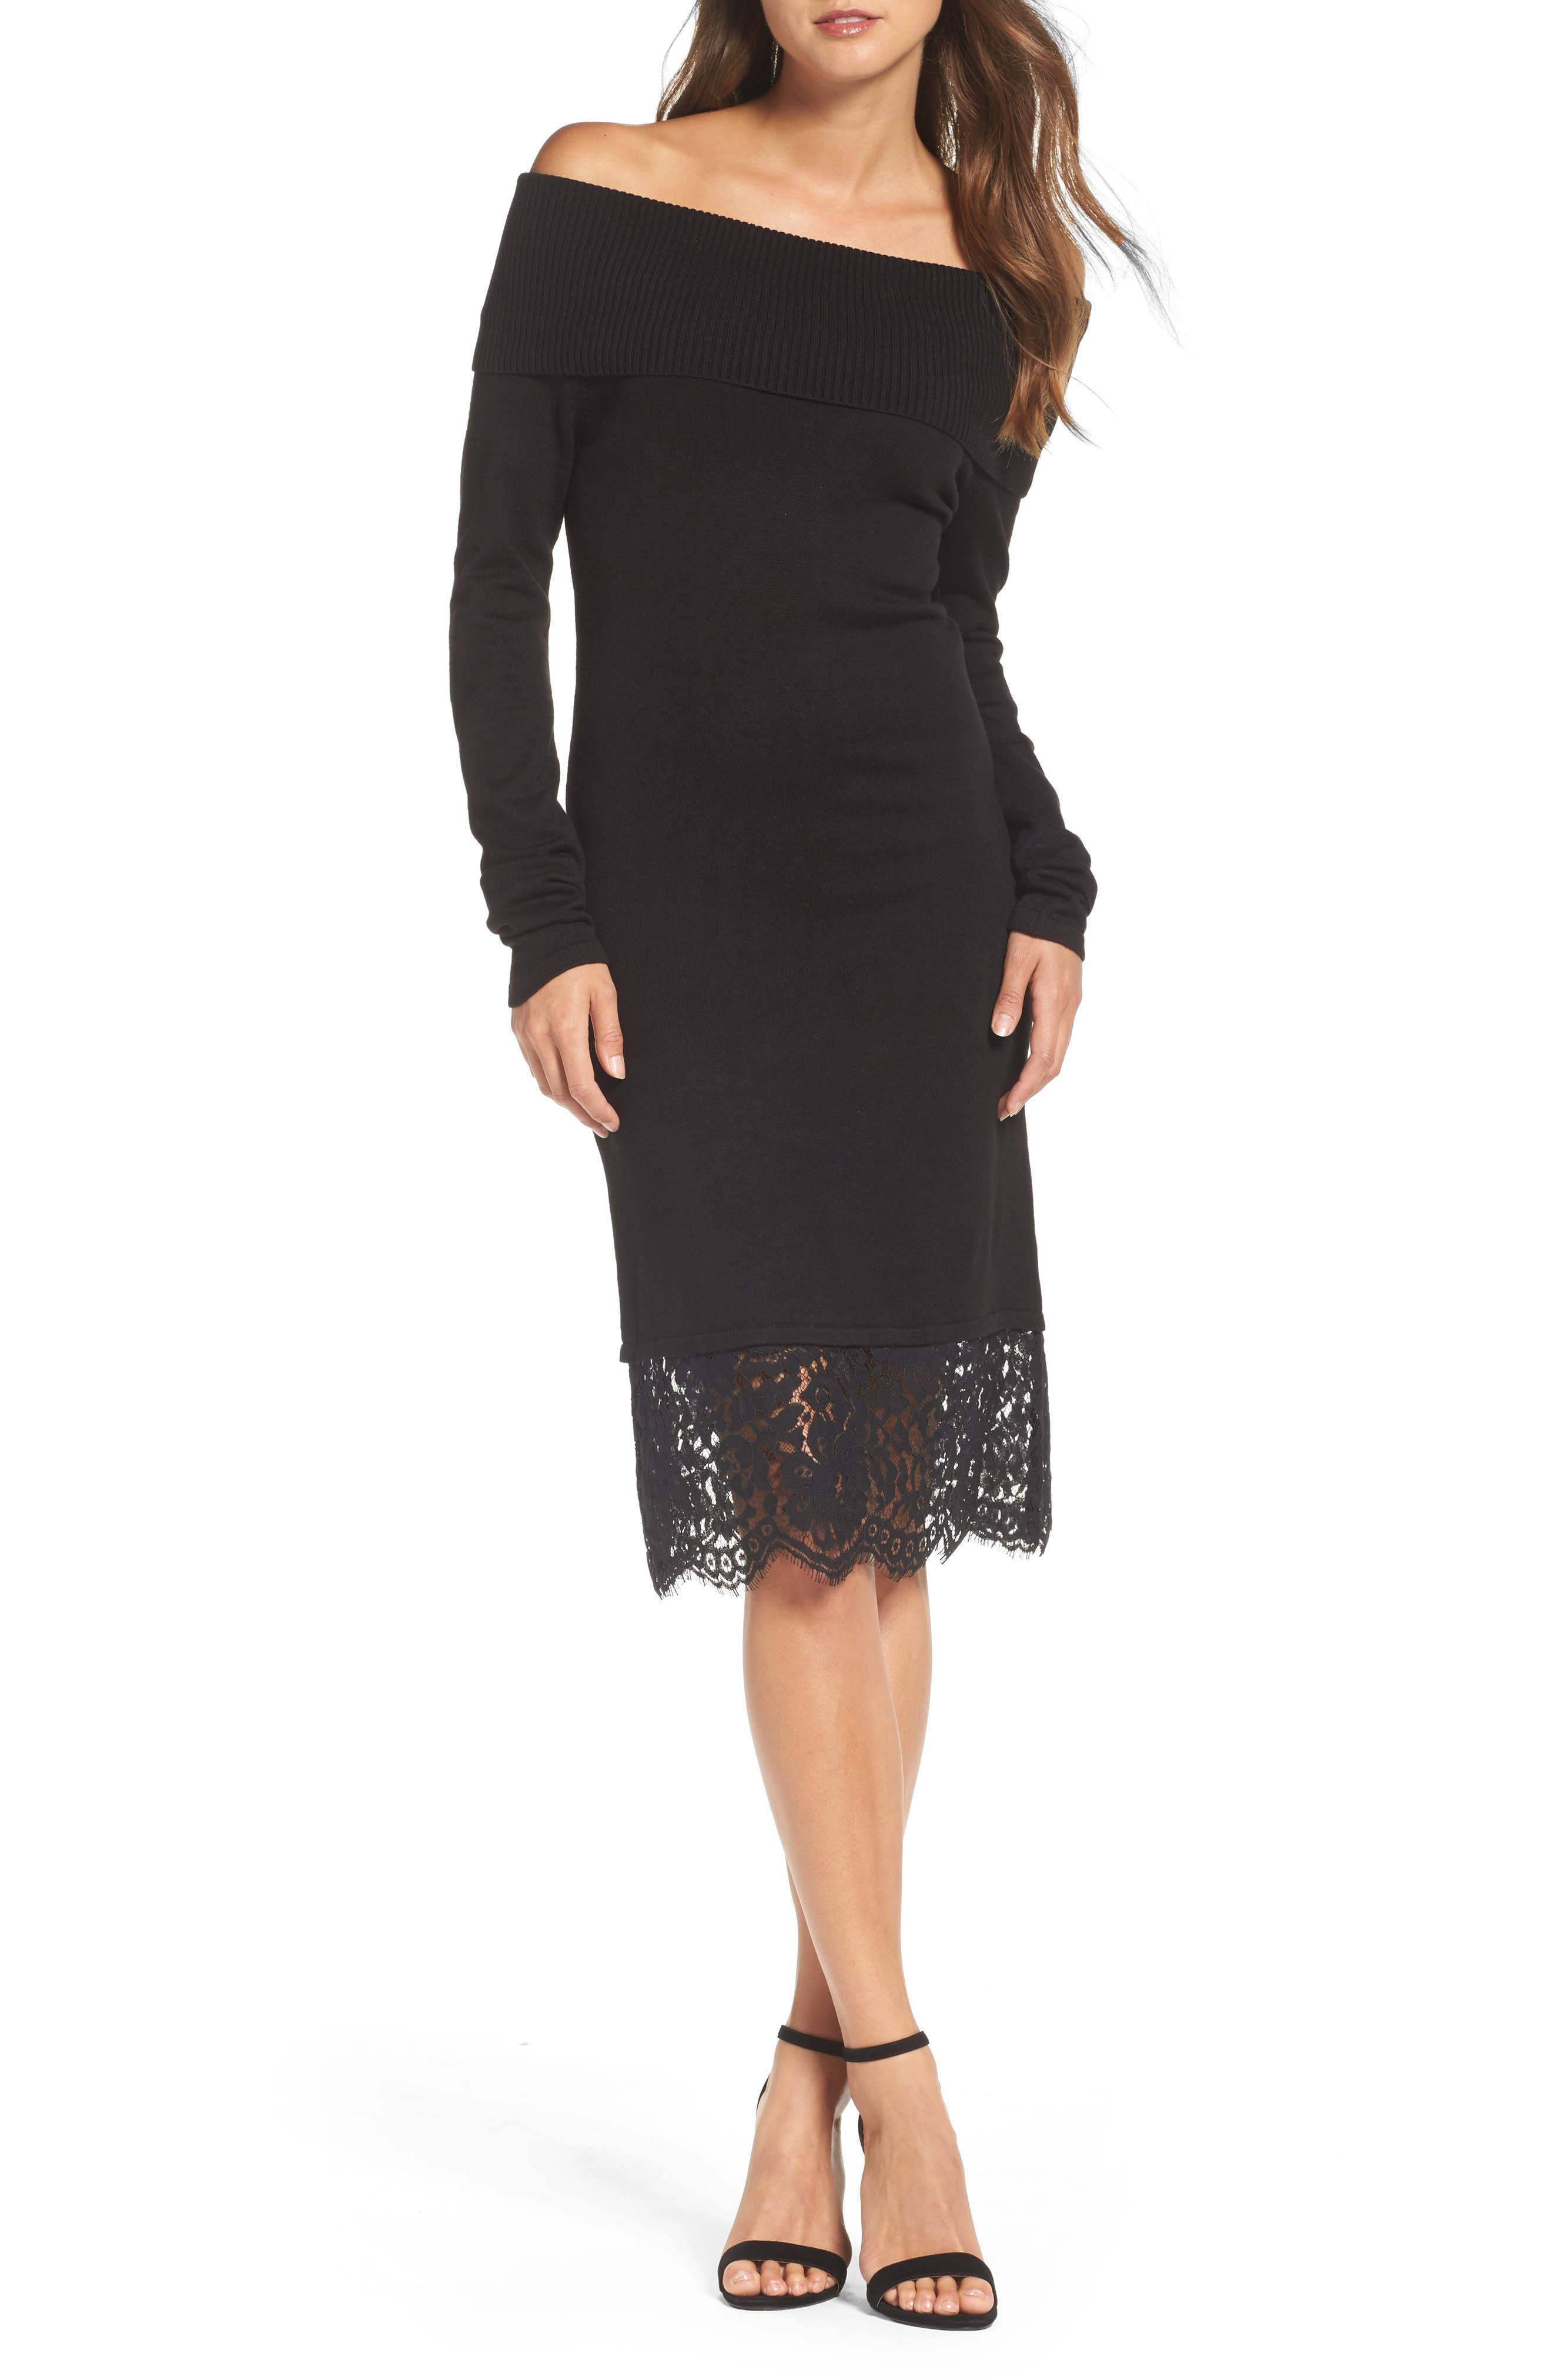 Main Image - Chelsea28 Off the Shoulder Sheath Dress